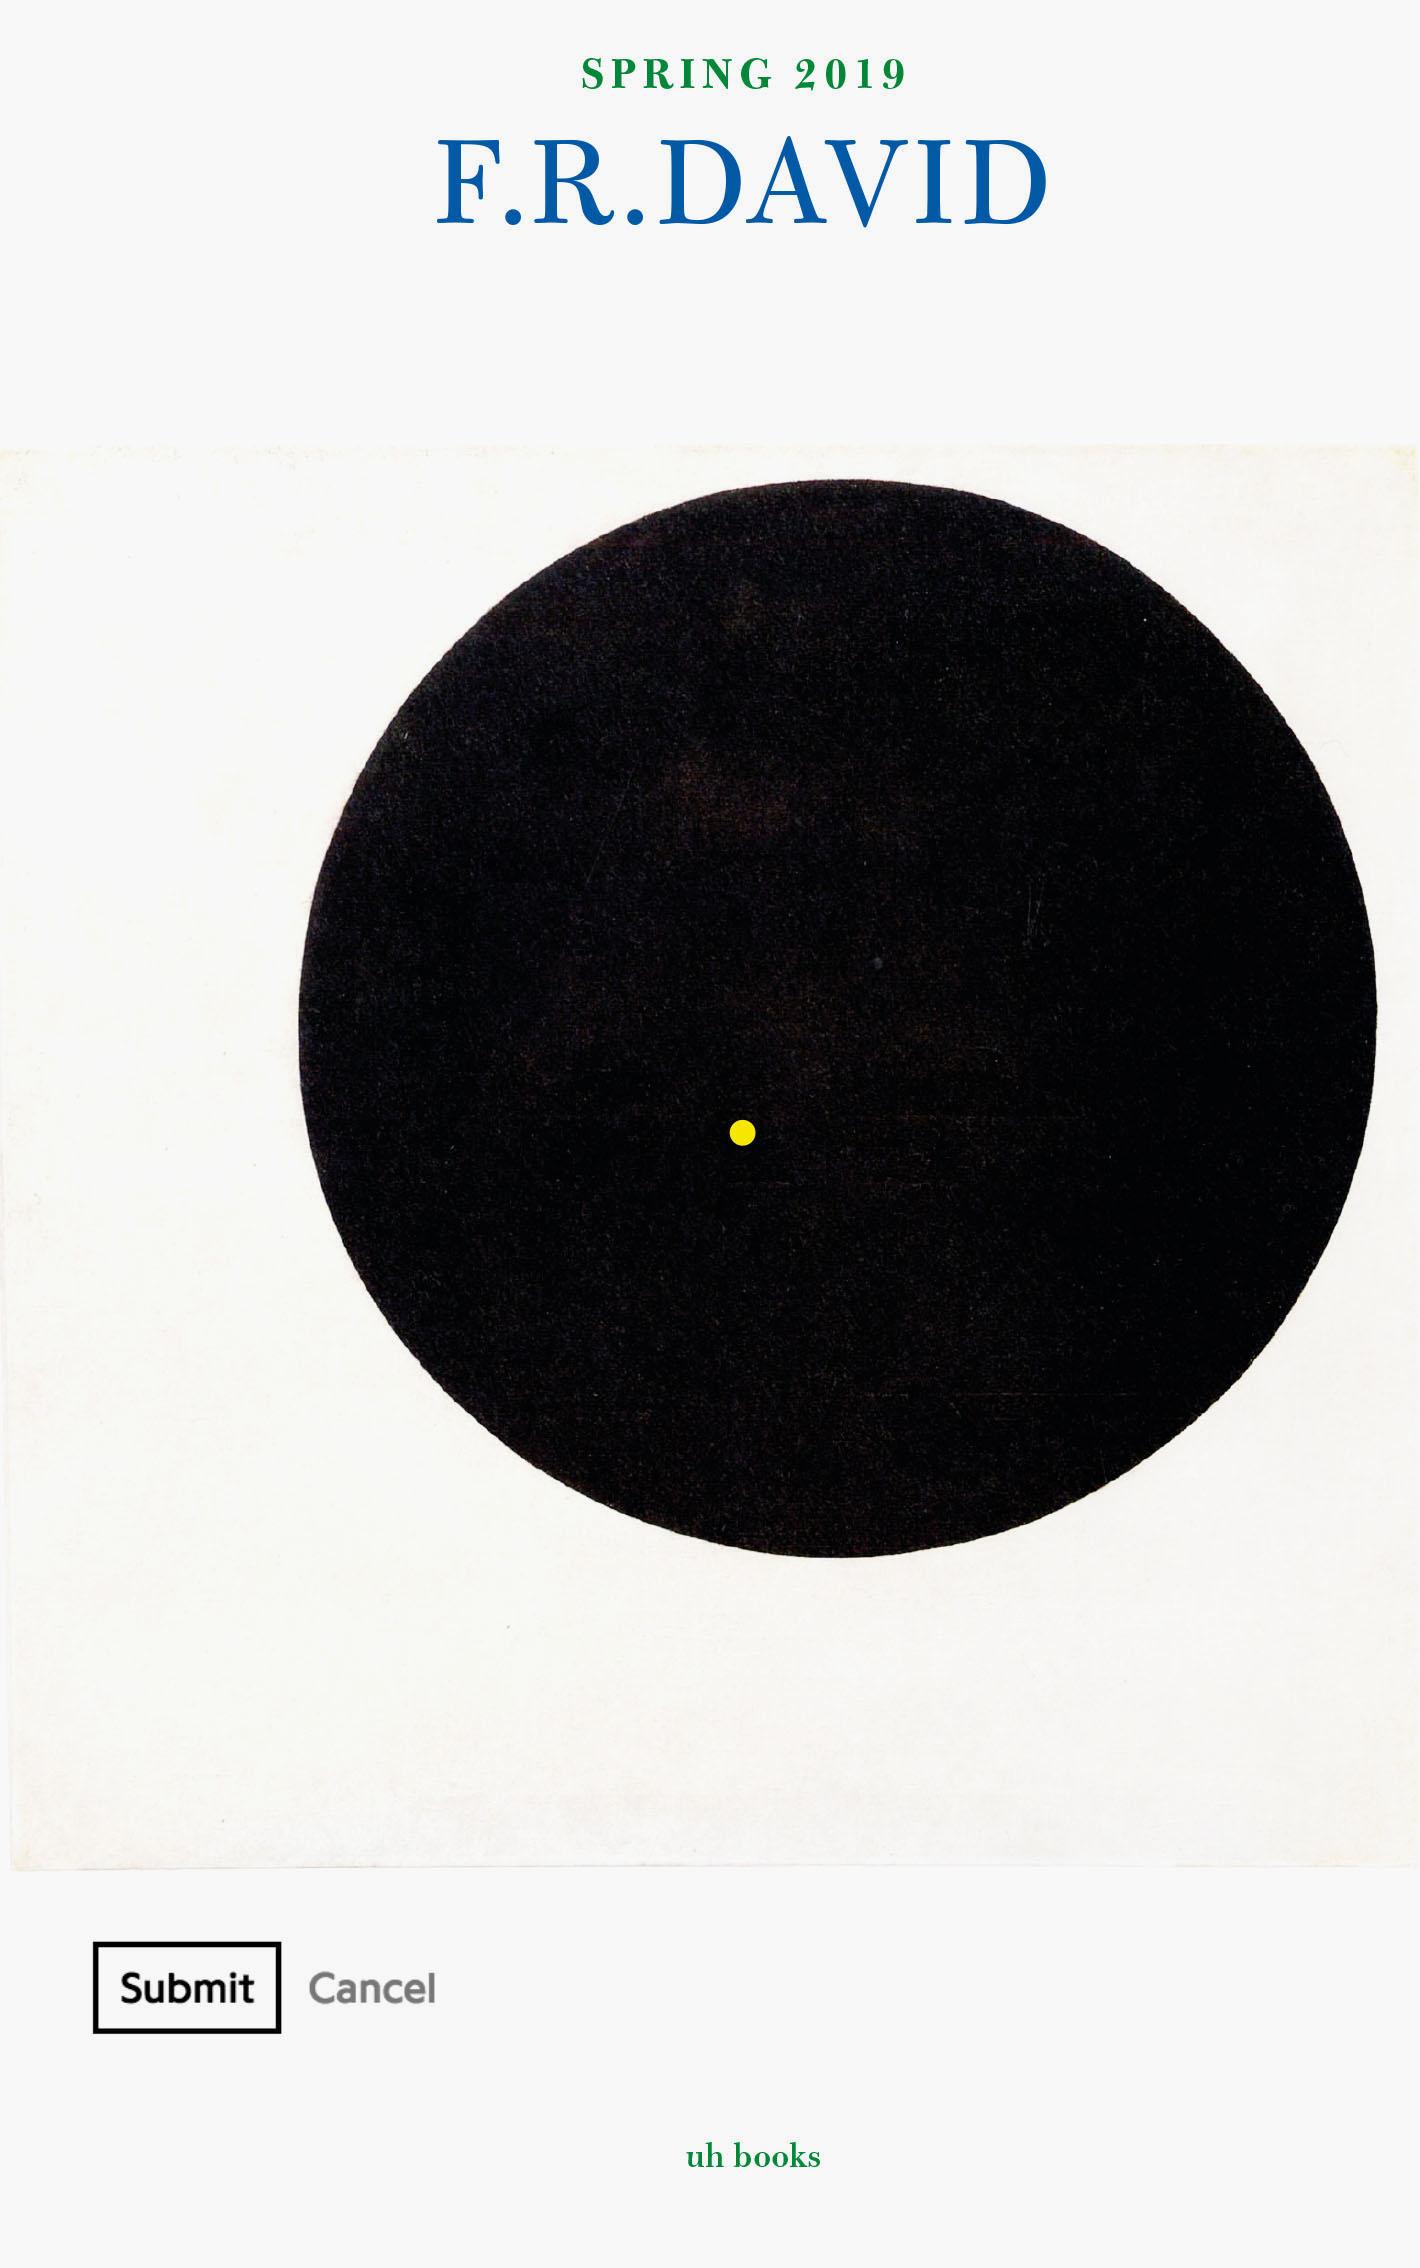 F R DAVID Black Sun and 5/4 – KW Institute for Contemporary Art